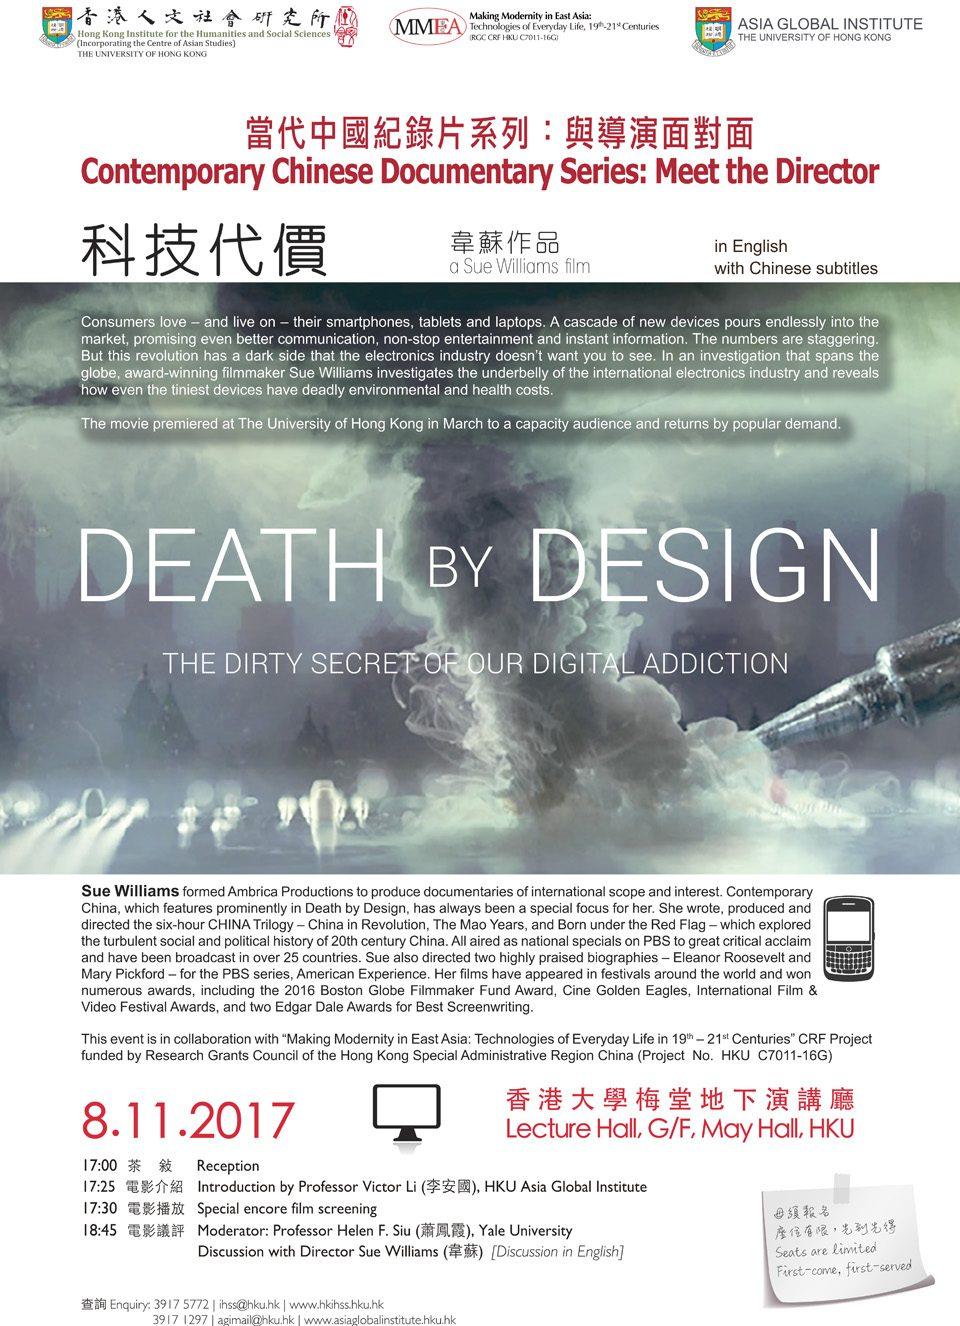 Death by Design 科技代價 (November 8, 2017)